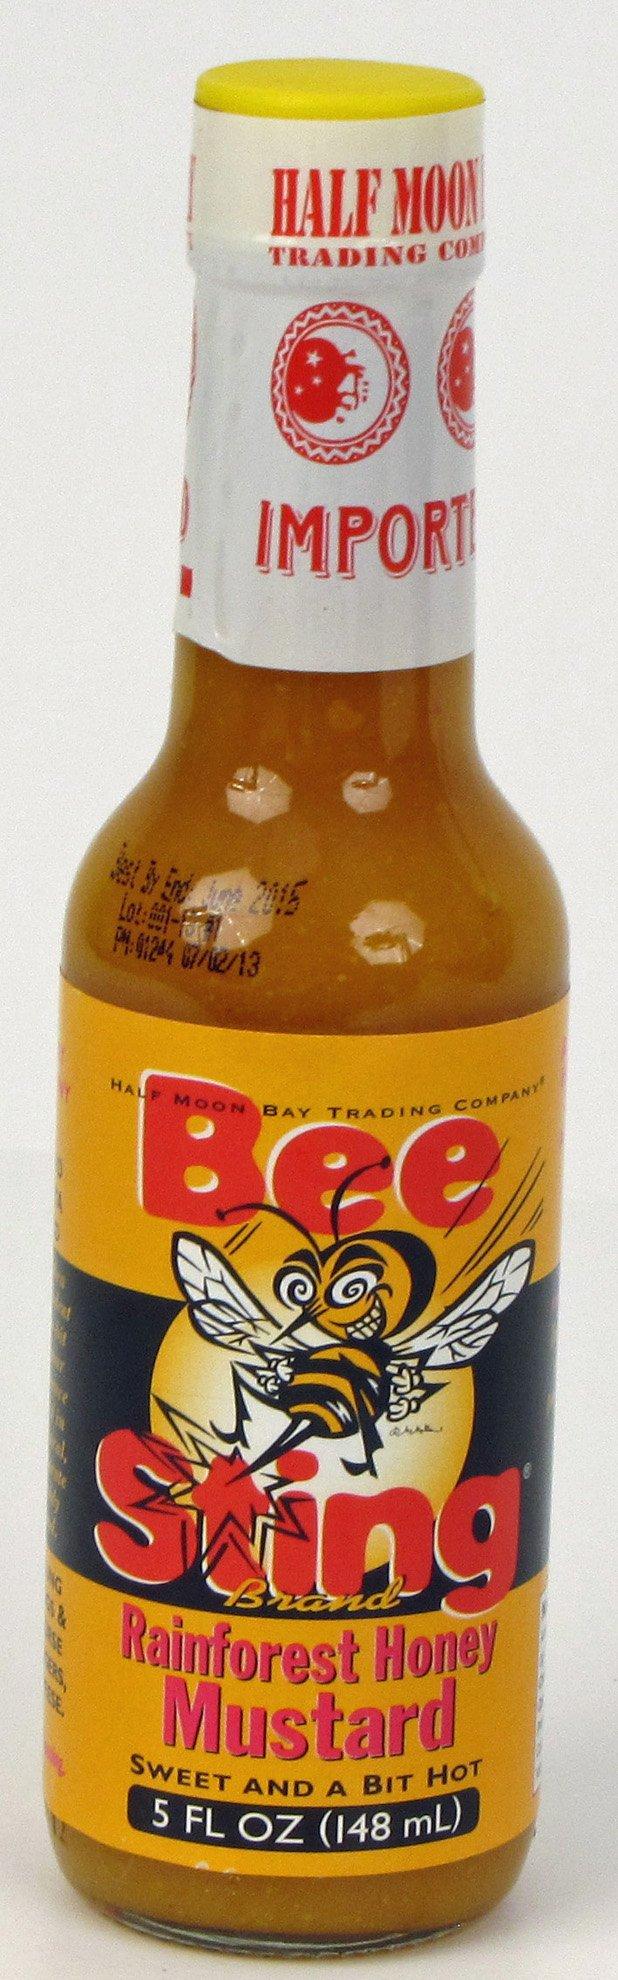 Bee Sting Rainforest Honey Mustard Hot Sauce